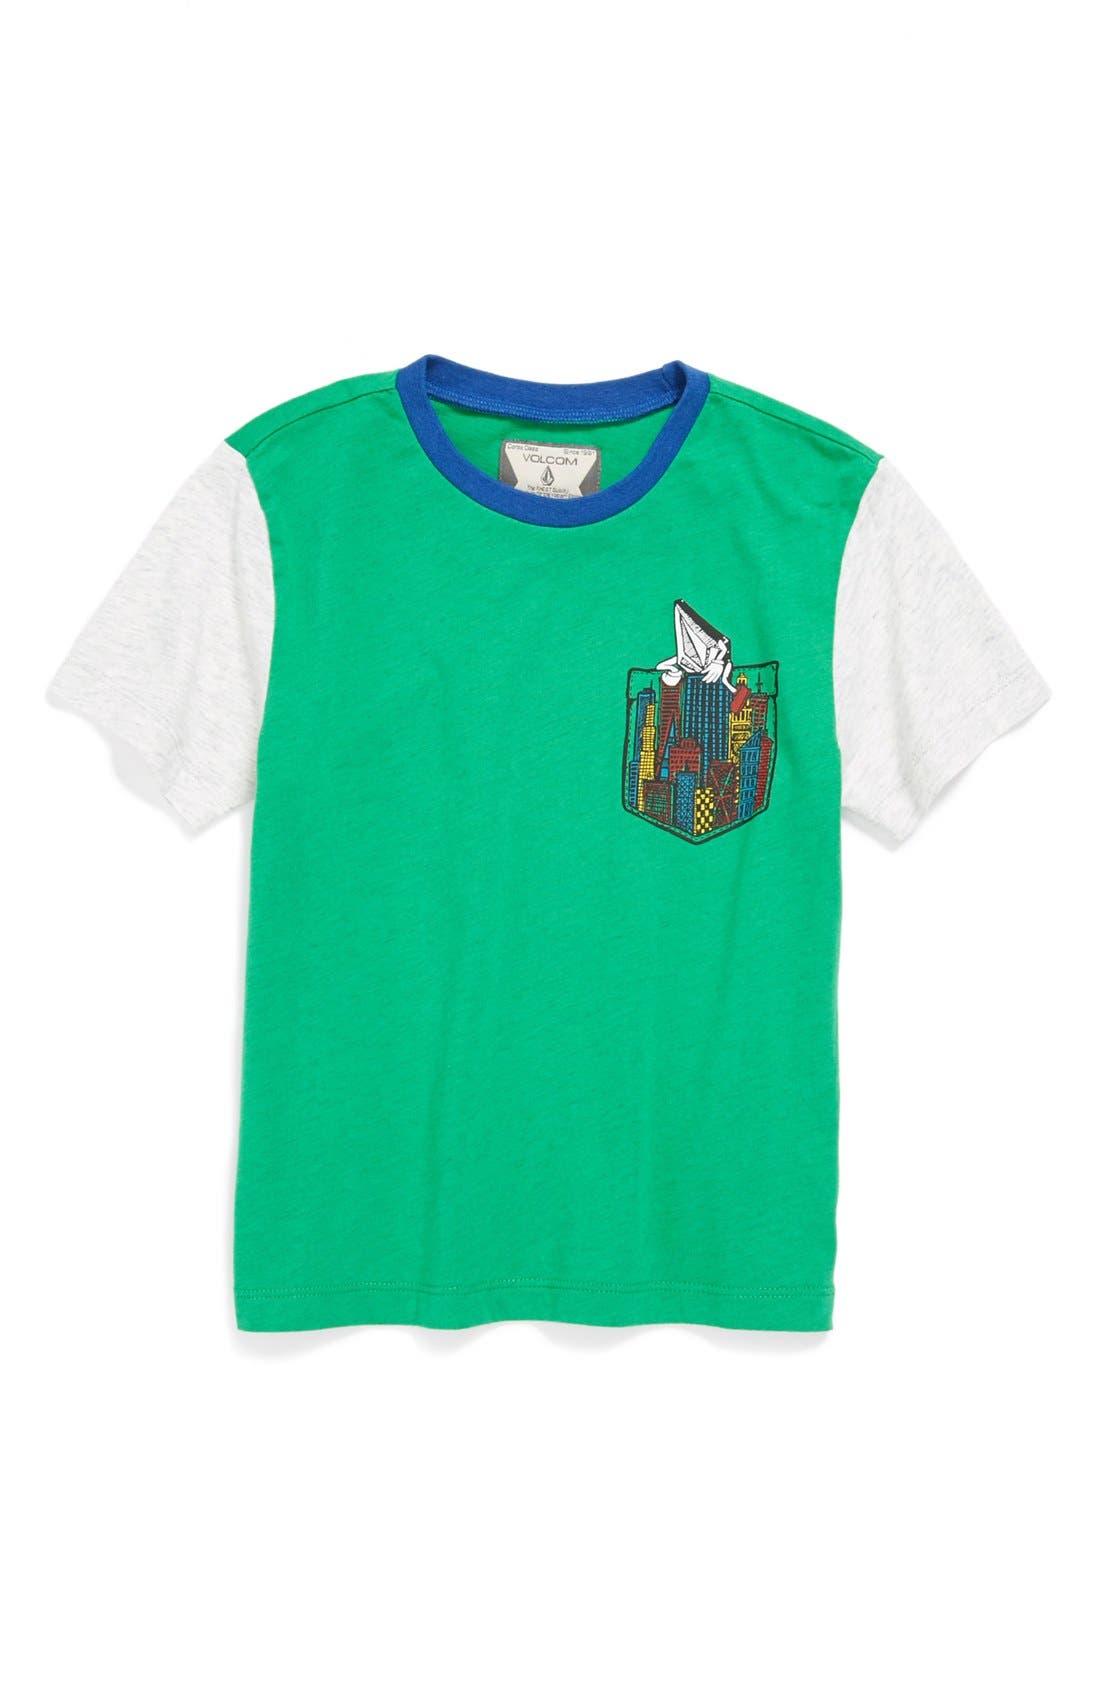 Main Image - Volcom 'Hang On' Crewneck T-Shirt (Toddler)